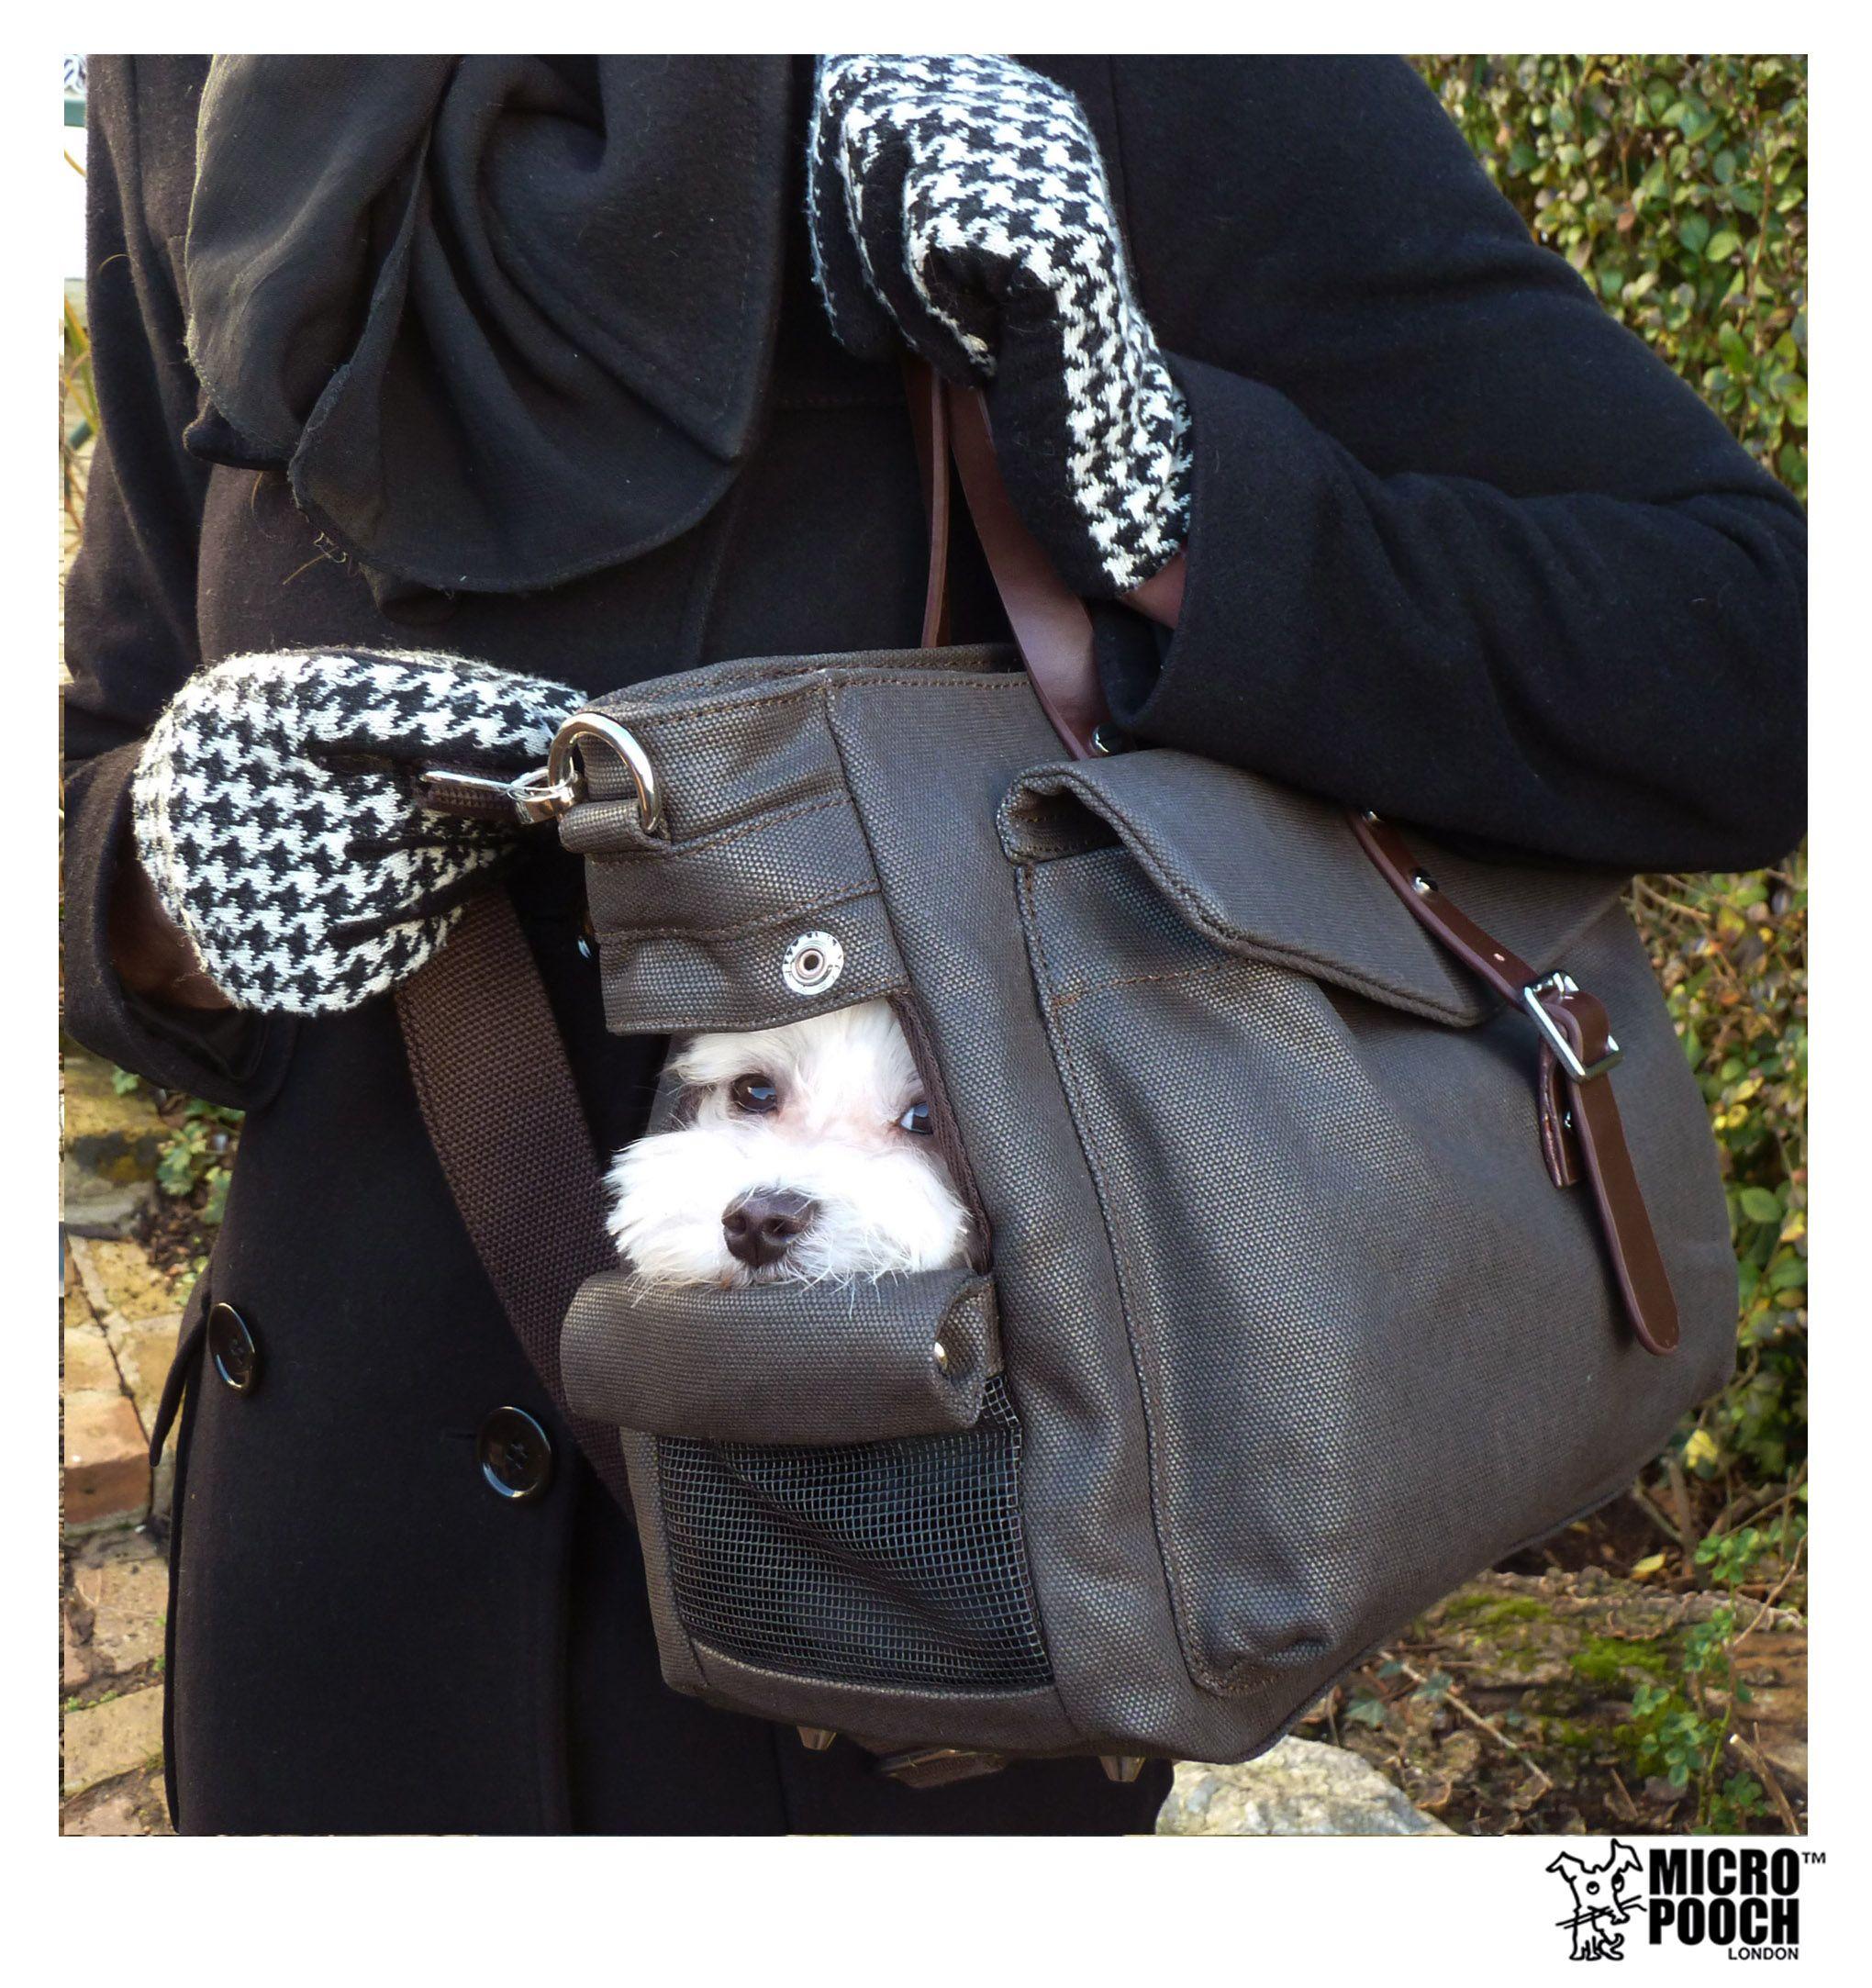 fa4bf463c8c2 Dog Handbag. The 3-way Tote Dog Carrier / Bag / Purse by MICRO POOCH. Designer  Luxury Pet Travel Bag.